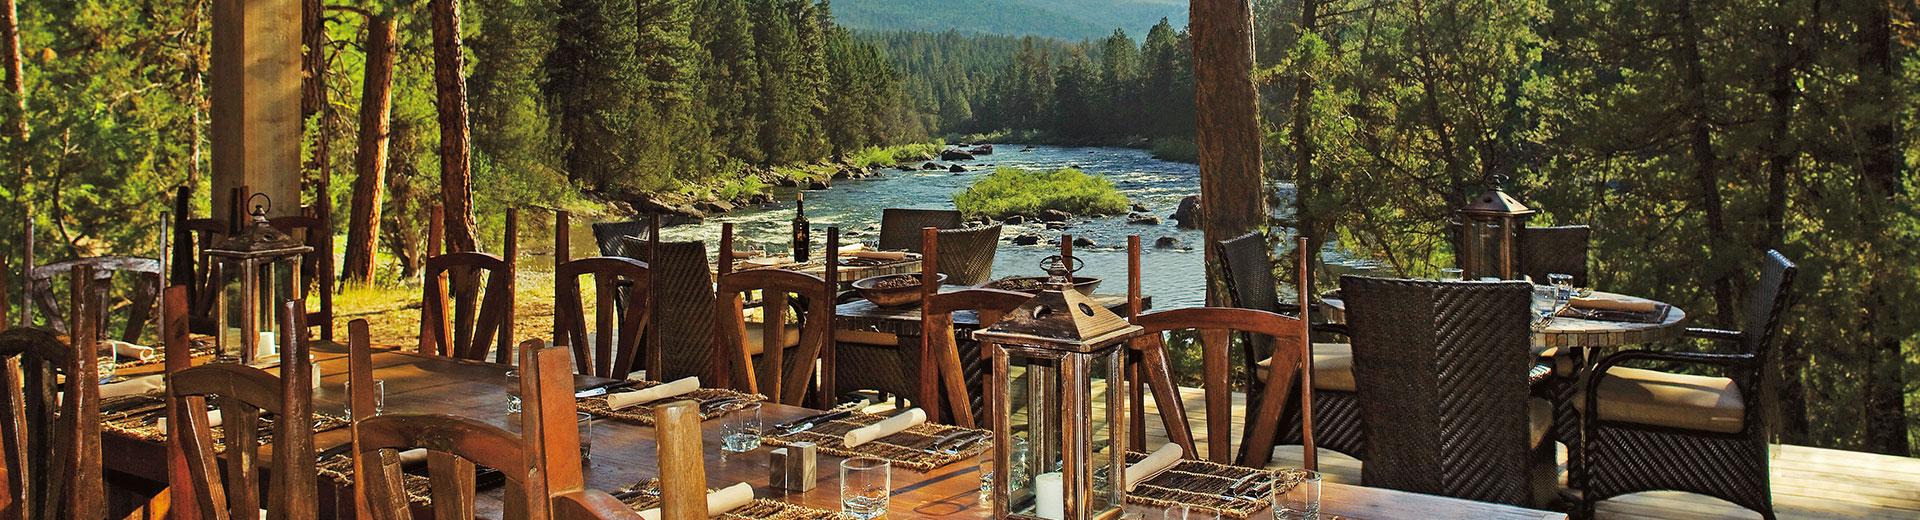 River Camp Dining Pavilion